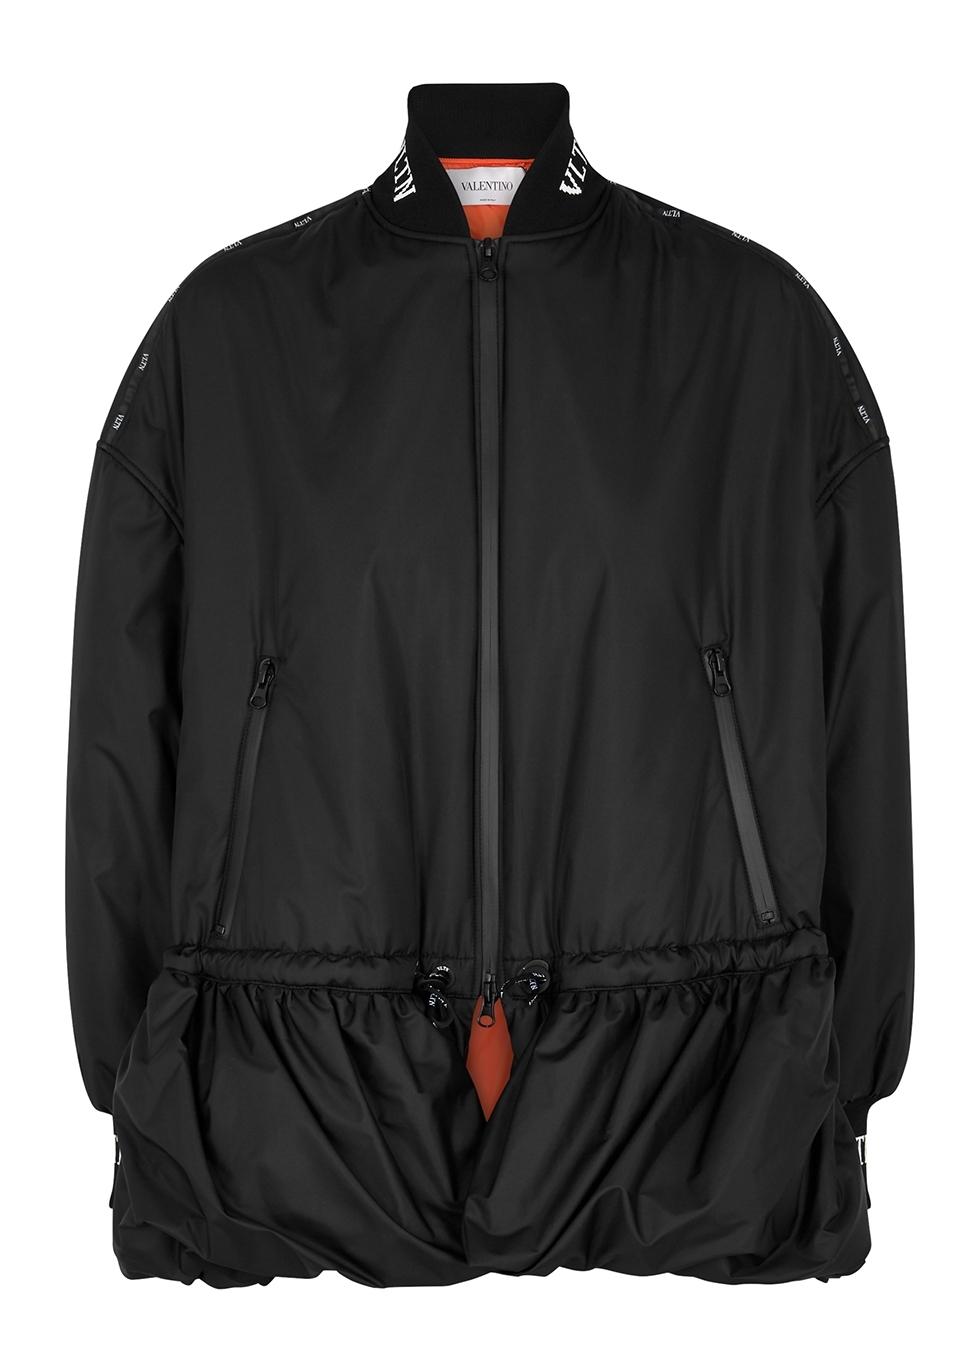 afaa9941a7 Valentino - Designer Bags, Shoes, Trainers - Harvey Nichols